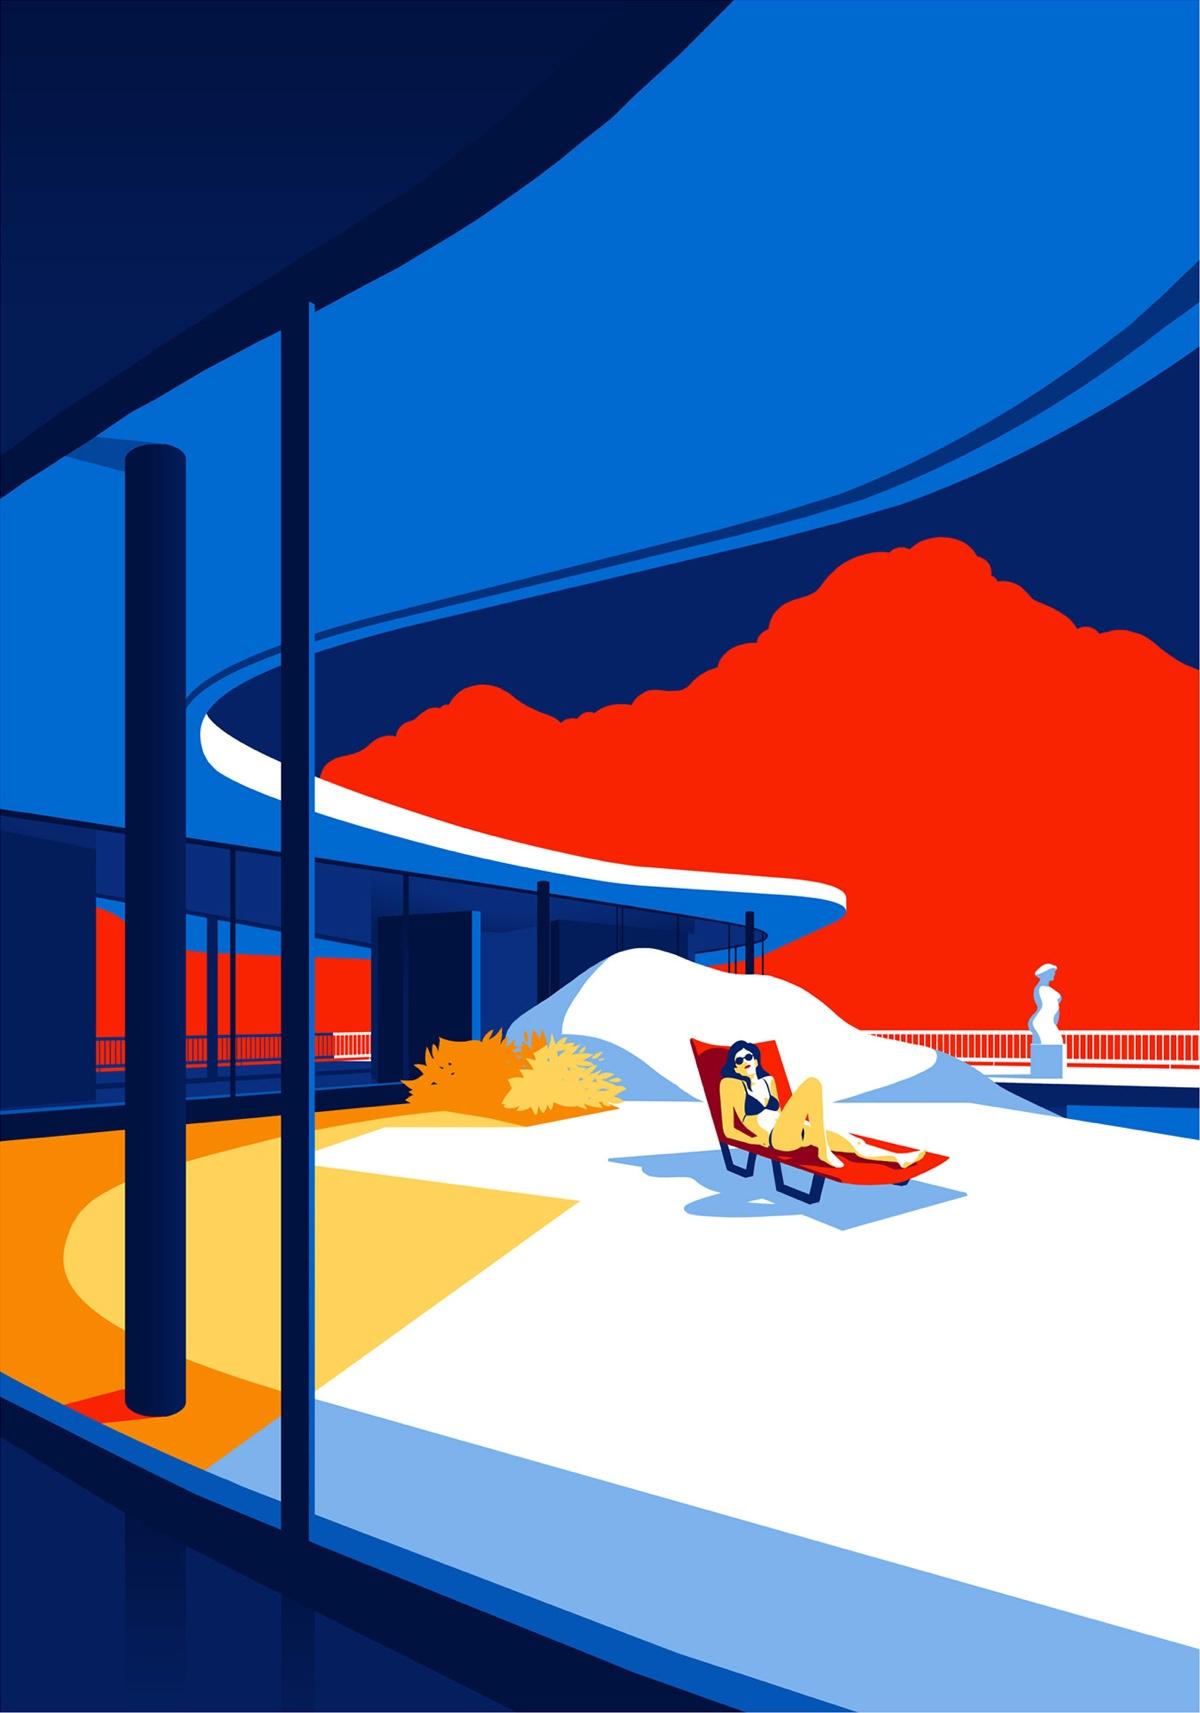 oscar-niemeyer-architecture-illustrations-levente-szabo-9